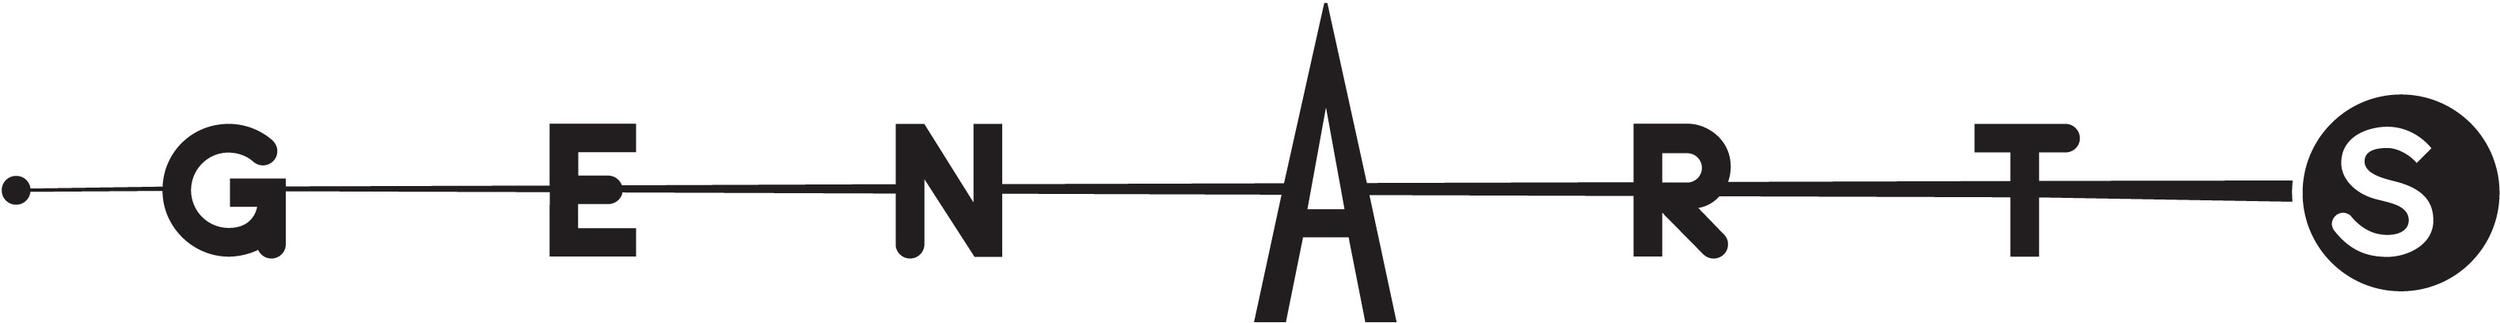 GenArts-logo.png